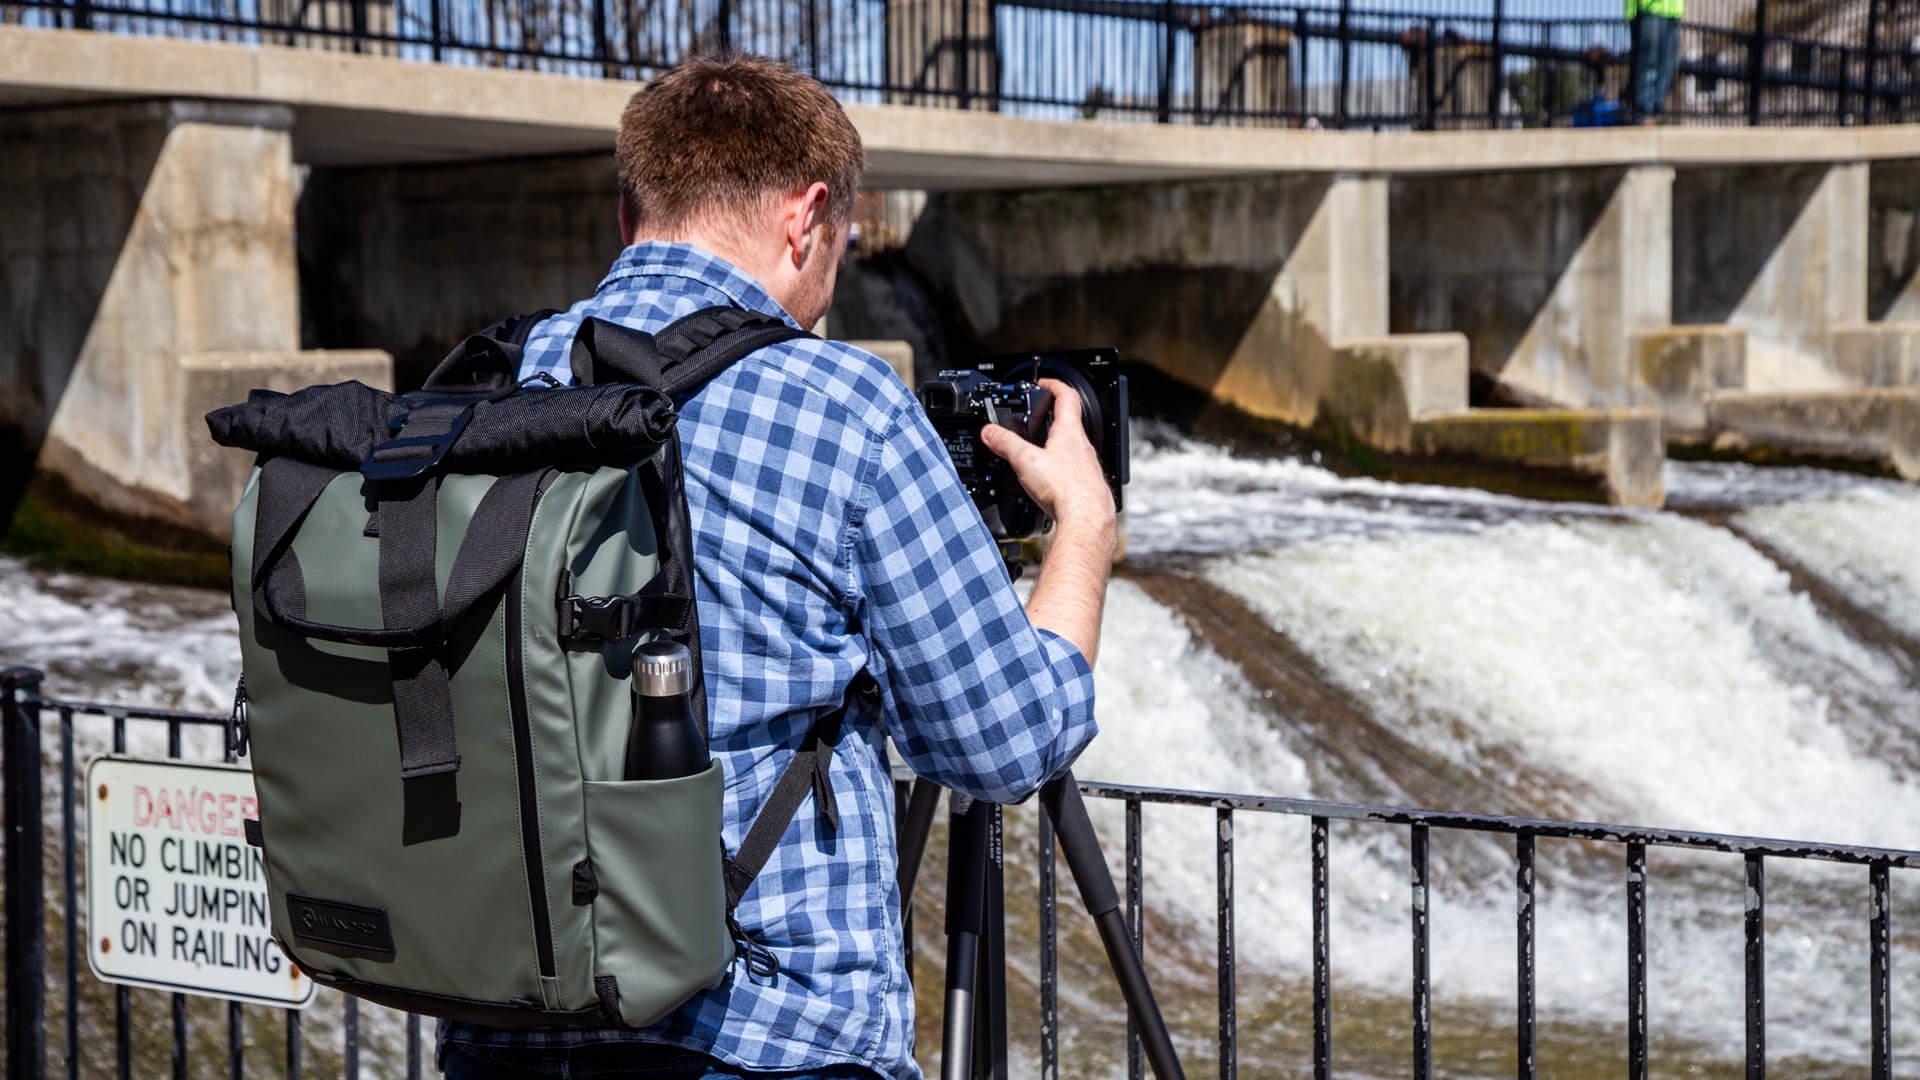 Wandrd PRVKE backpack offers extreme comfort, customizability